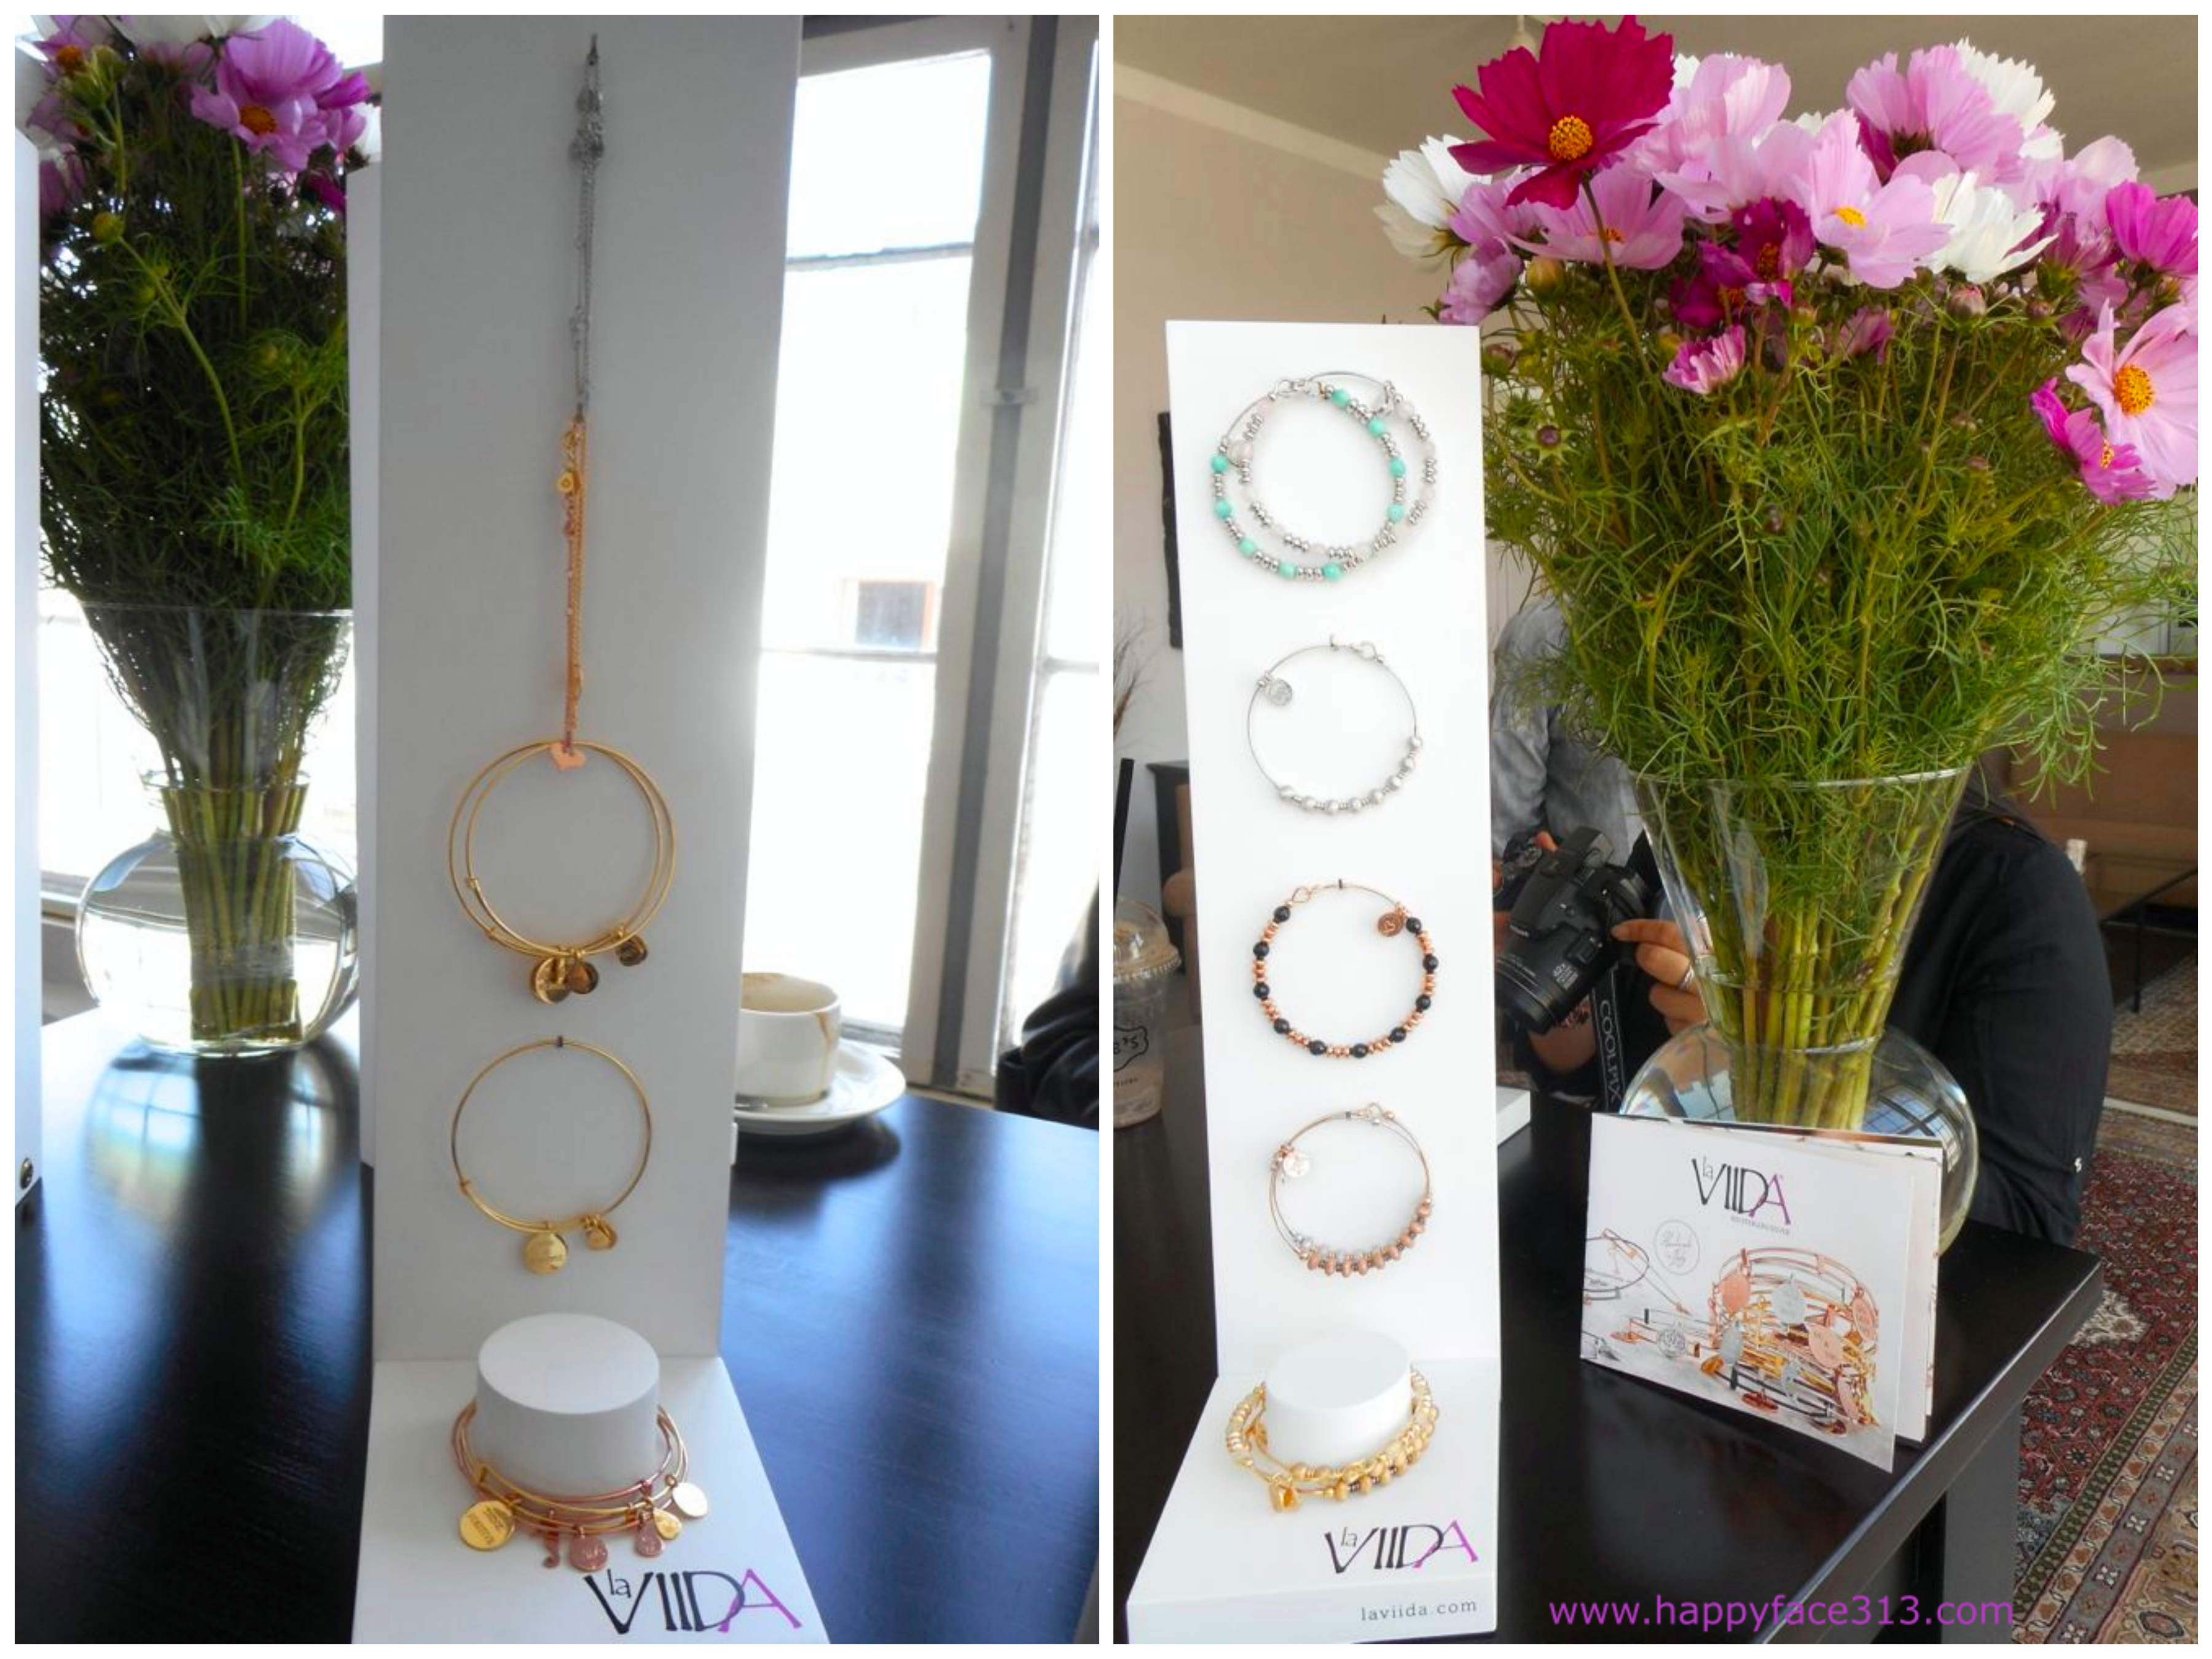 La Viida Simboli & Pallina Bangles and bracelets